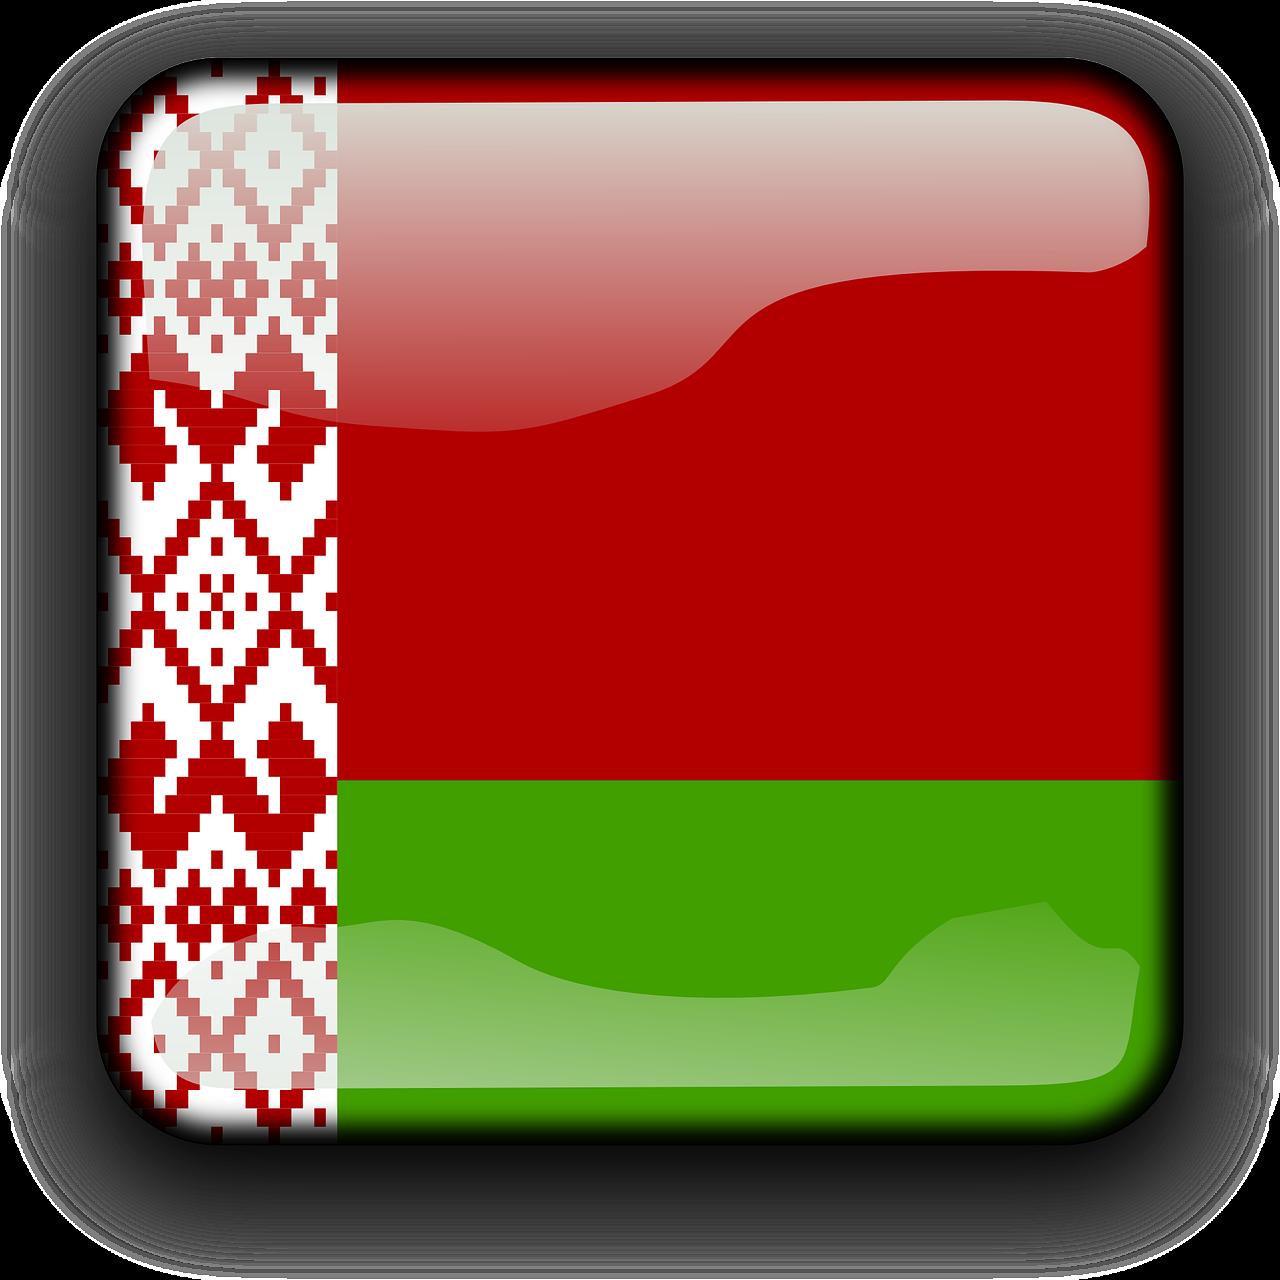 преобразить найти фото белорусский флаг фото